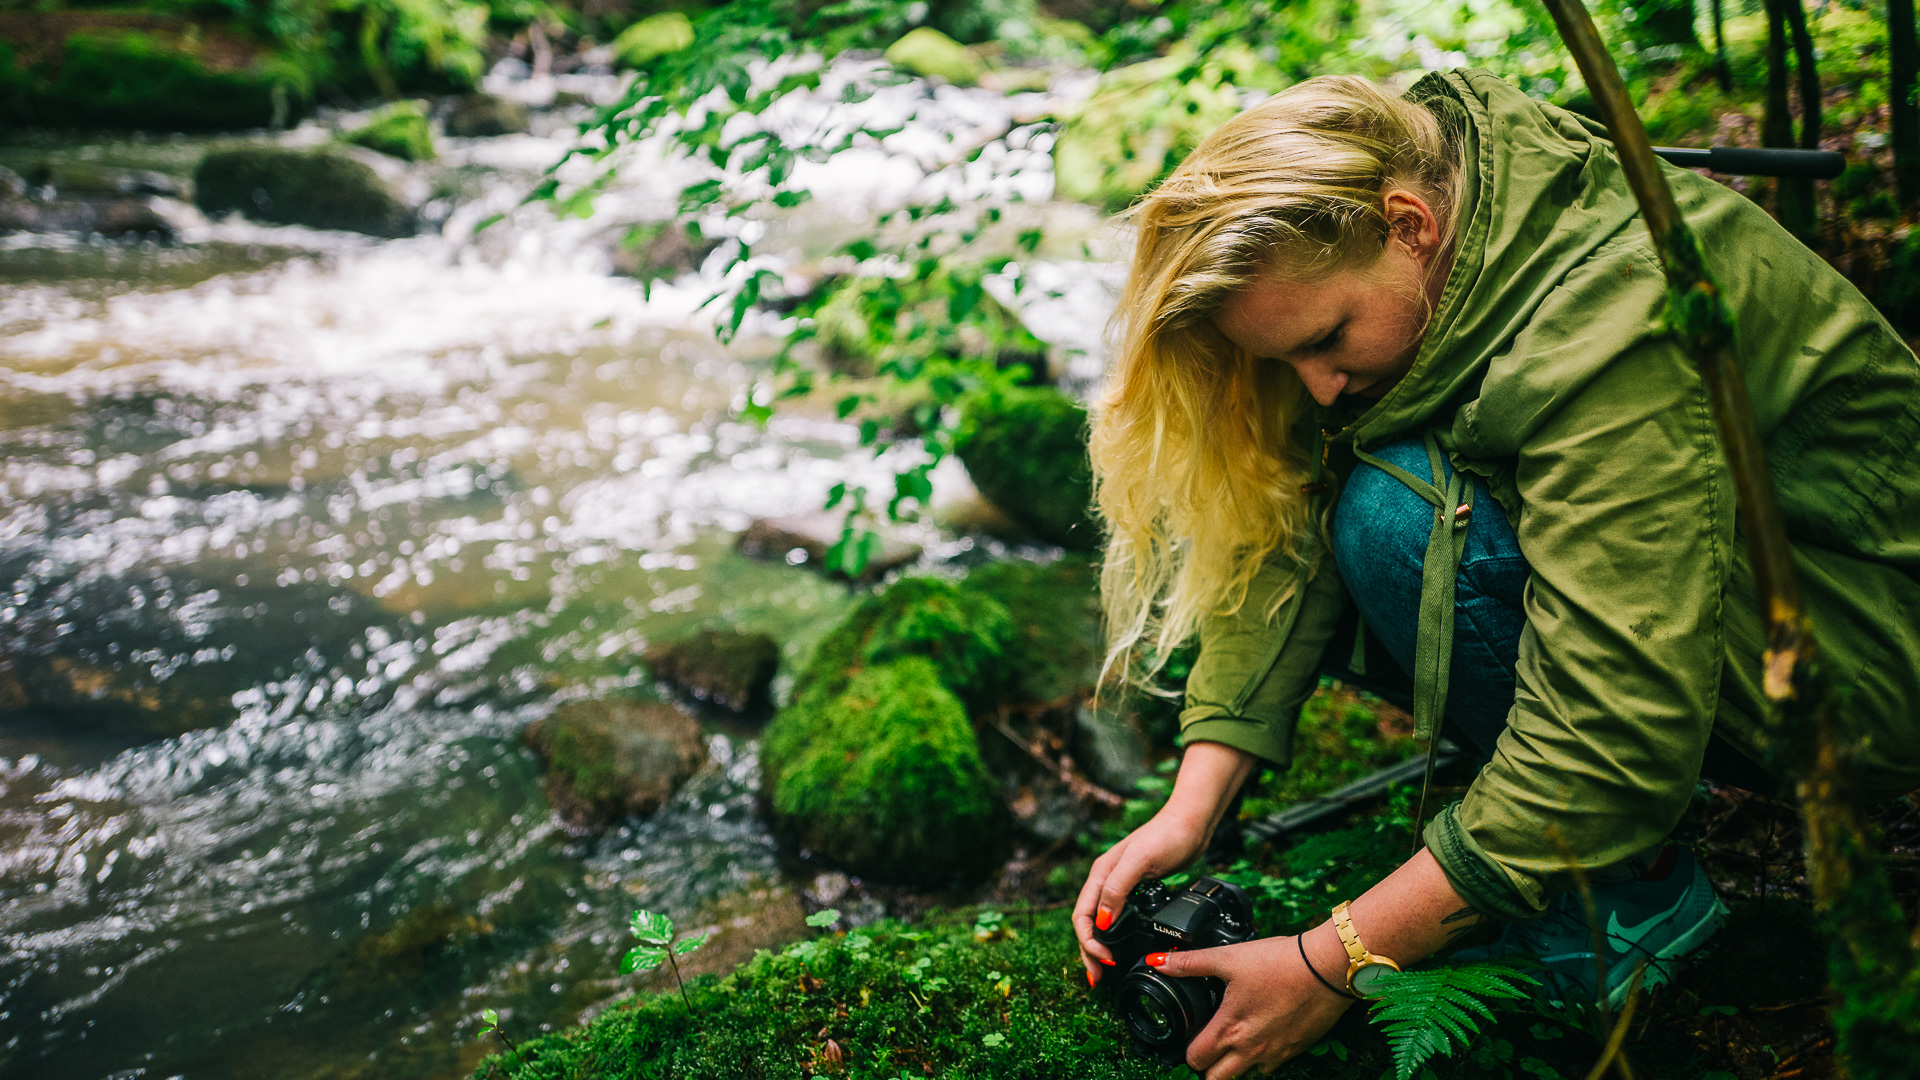 Marie Katzer im Wald at Work